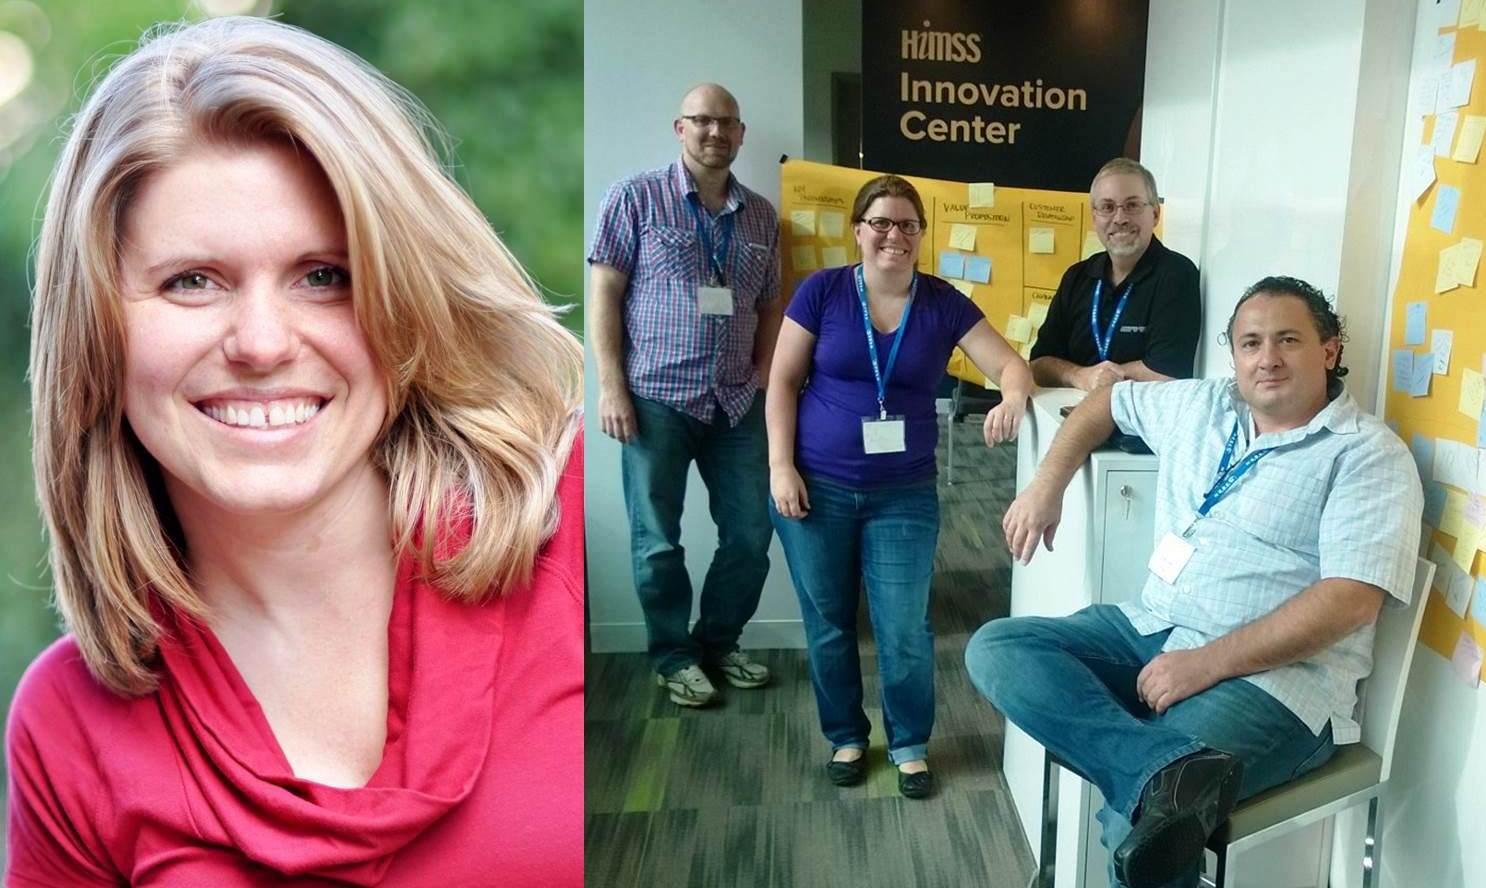 Tasha Markovich and hackathon team